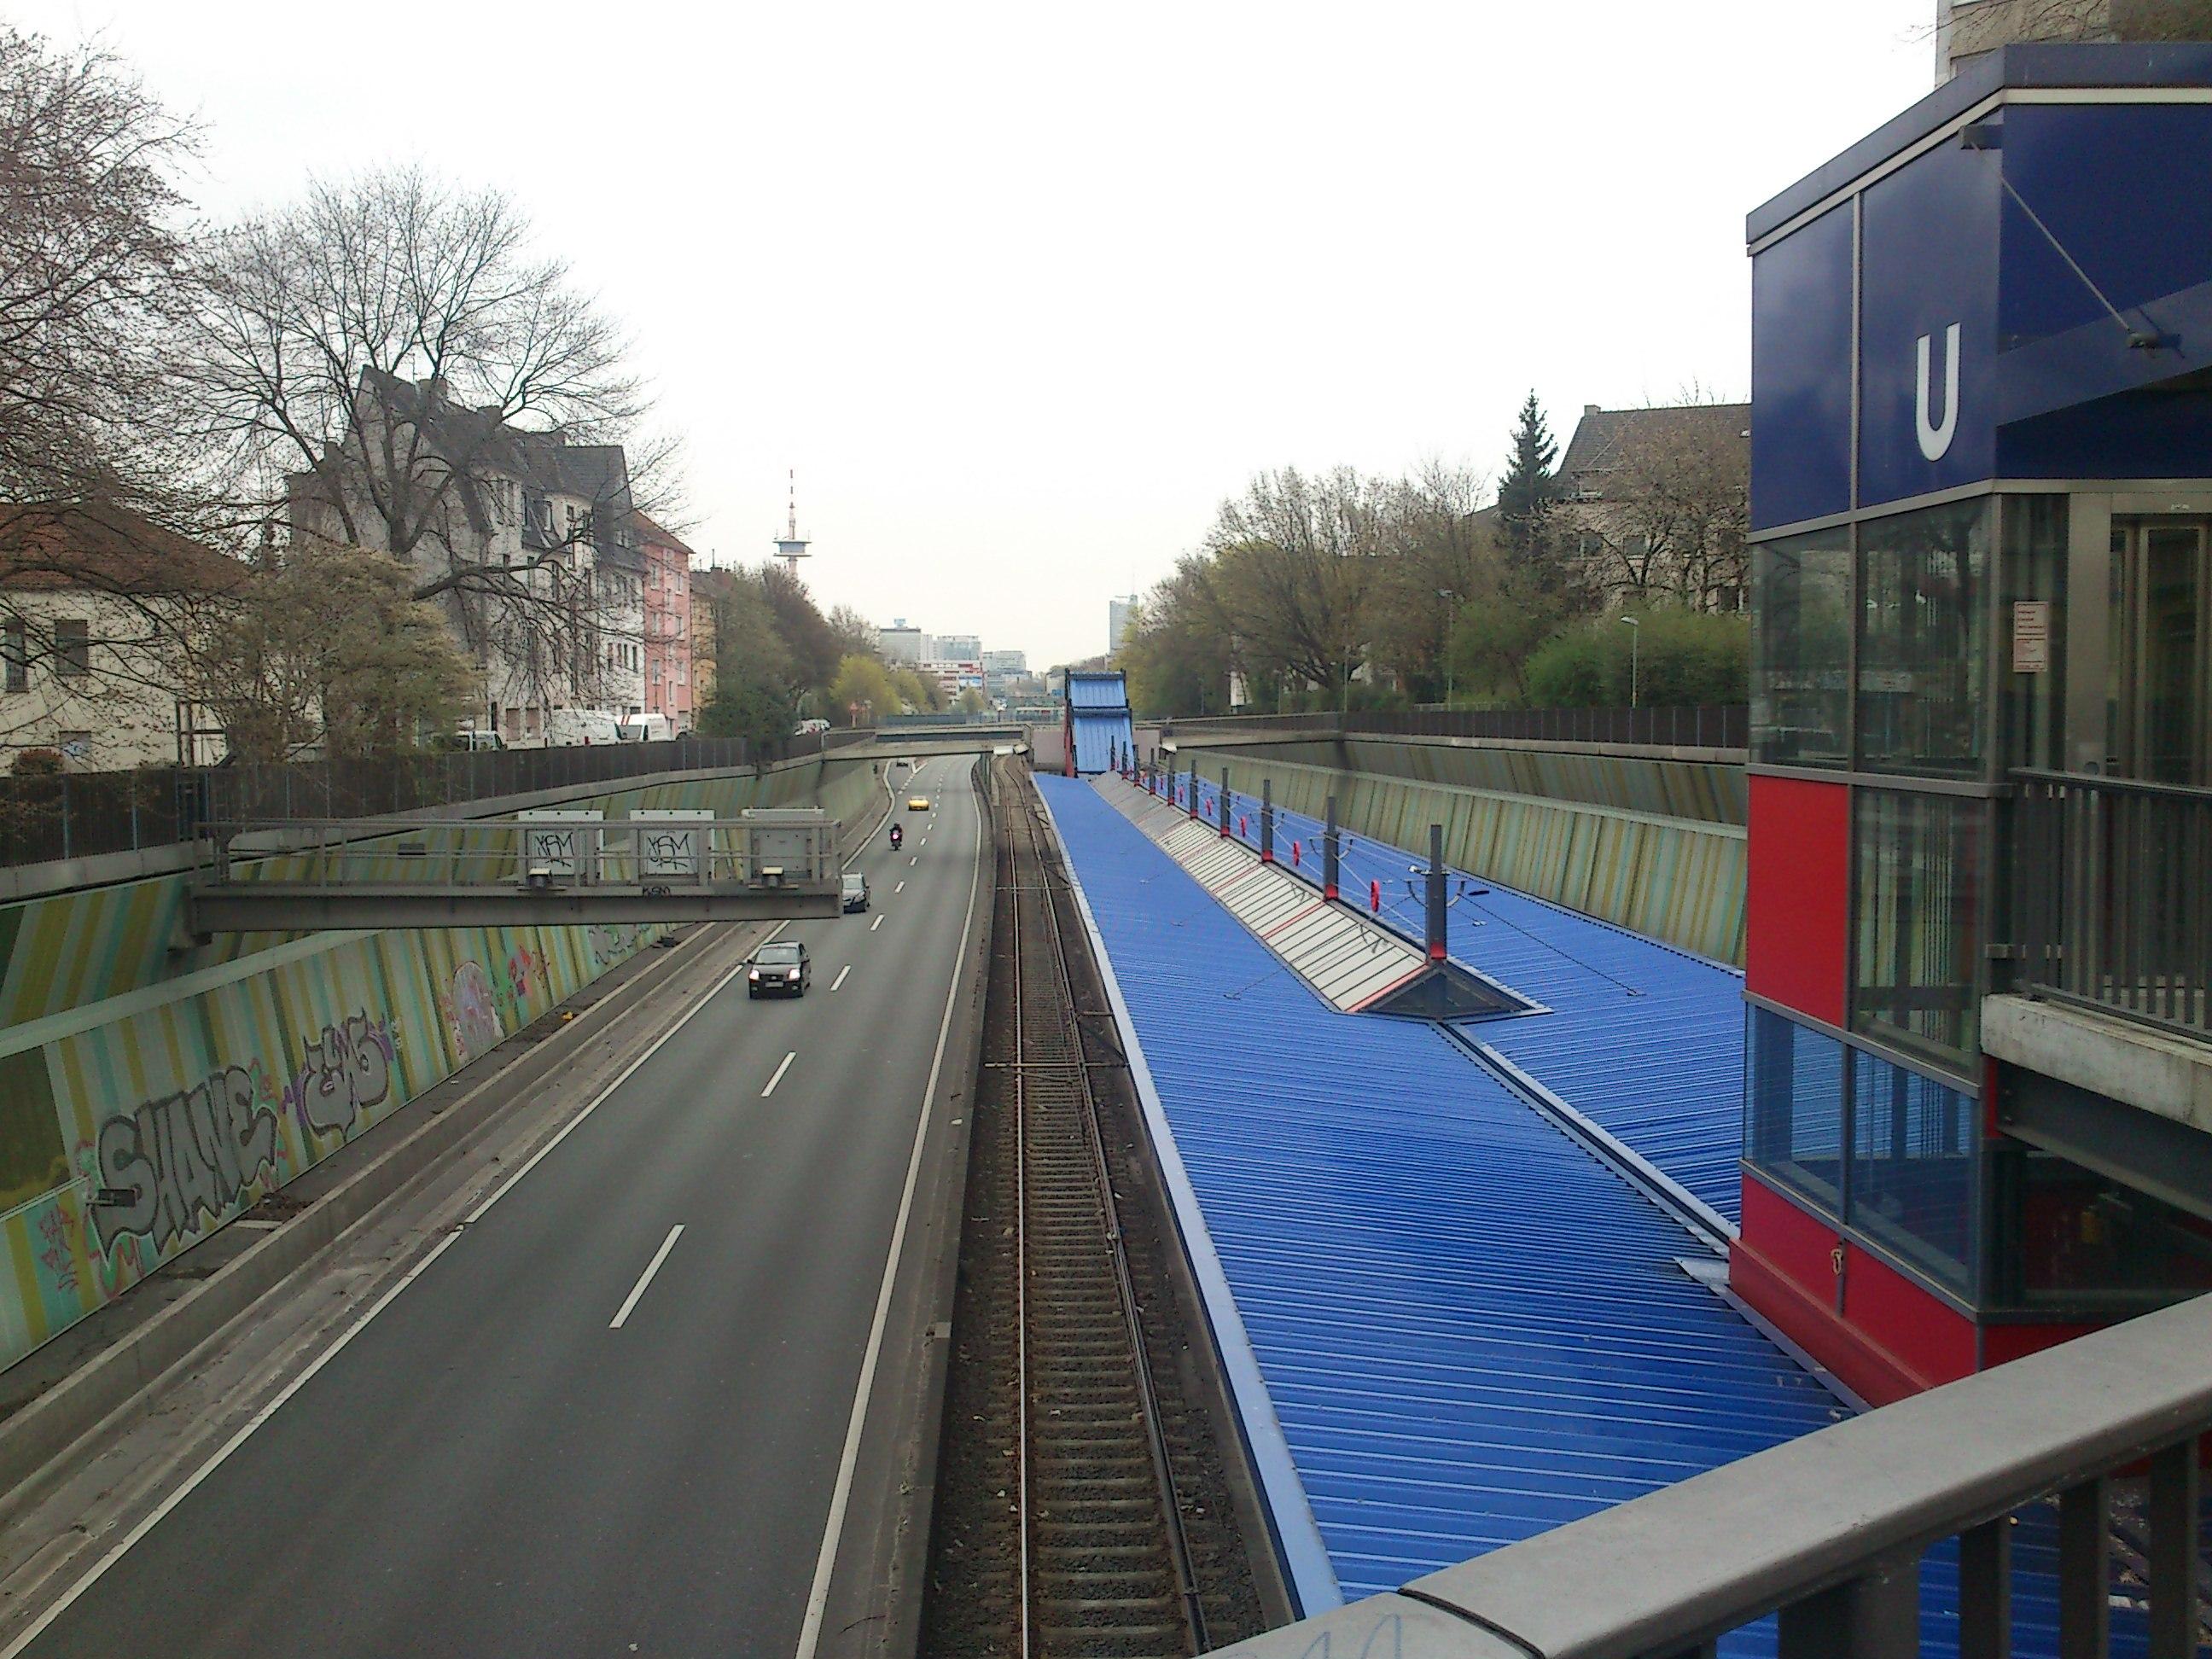 File:Breslauer Str., Essen - panoramio.jpg - Wikimedia Commons